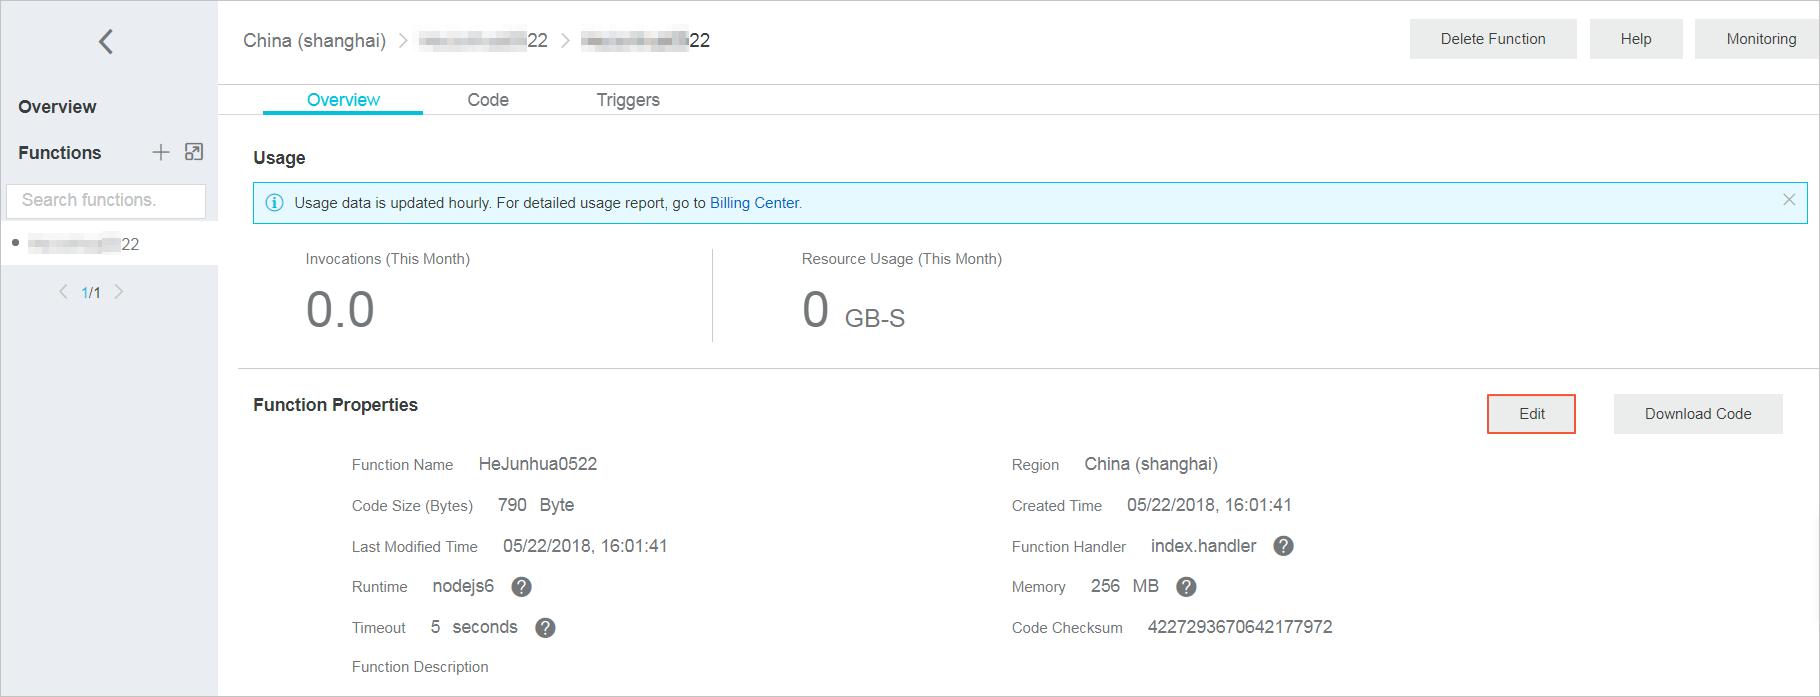 ![Update a function](http://docs-aliyun.cn-hangzhou.oss.aliyun-inc.com/assets/pic/73338/intl_en/1533628761642/EditFunctions.png)